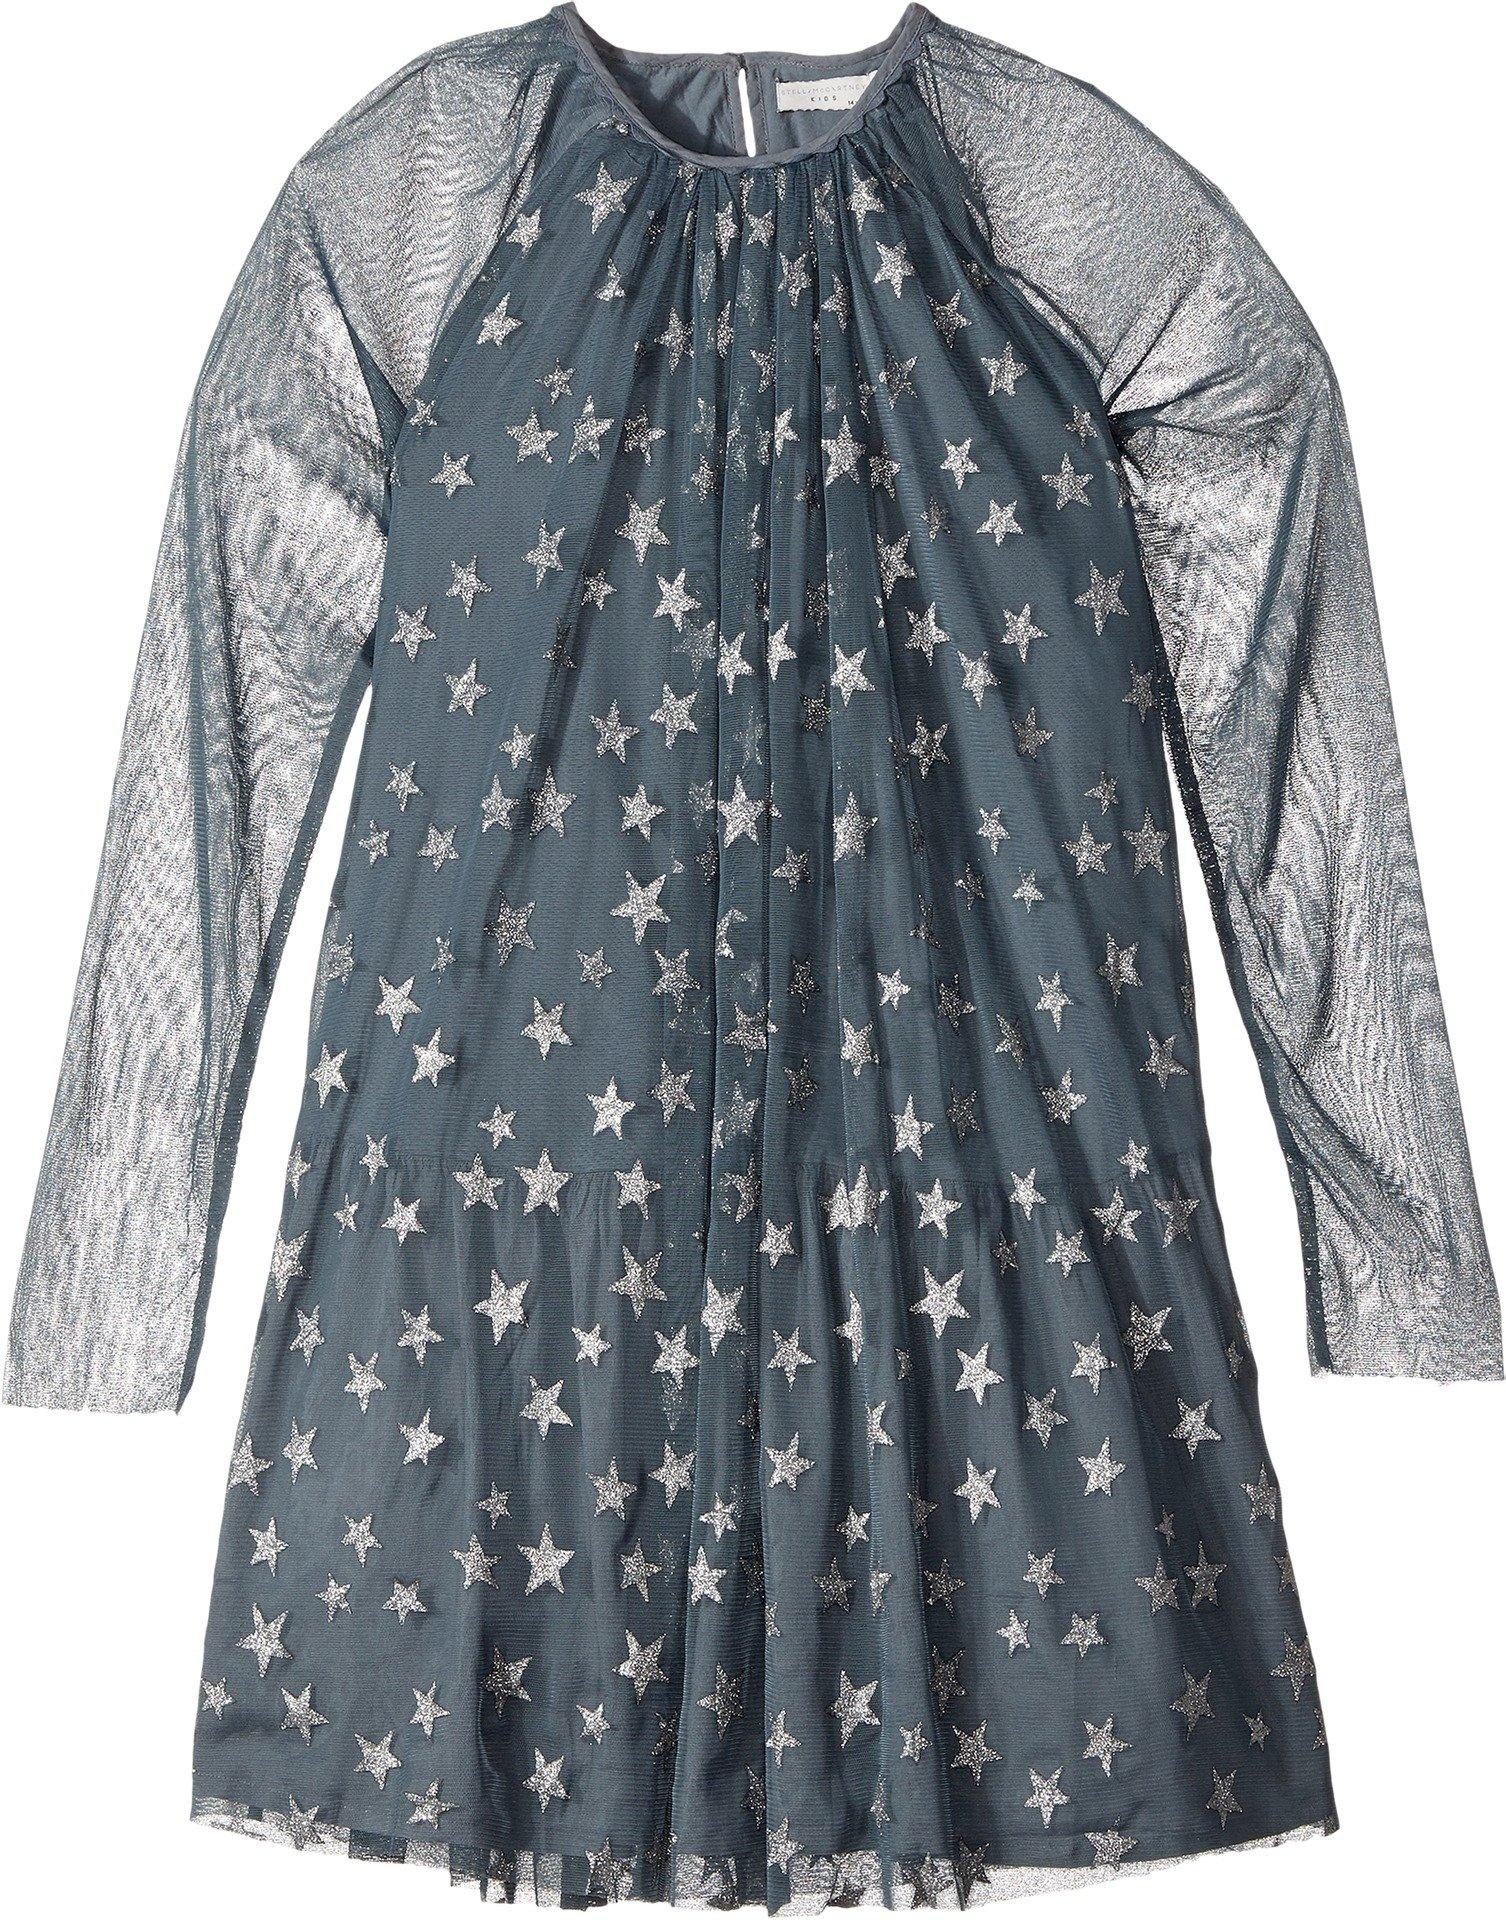 Stella McCartney Kids Girls' Misty Star Print Tulle Dress, Blue, 4